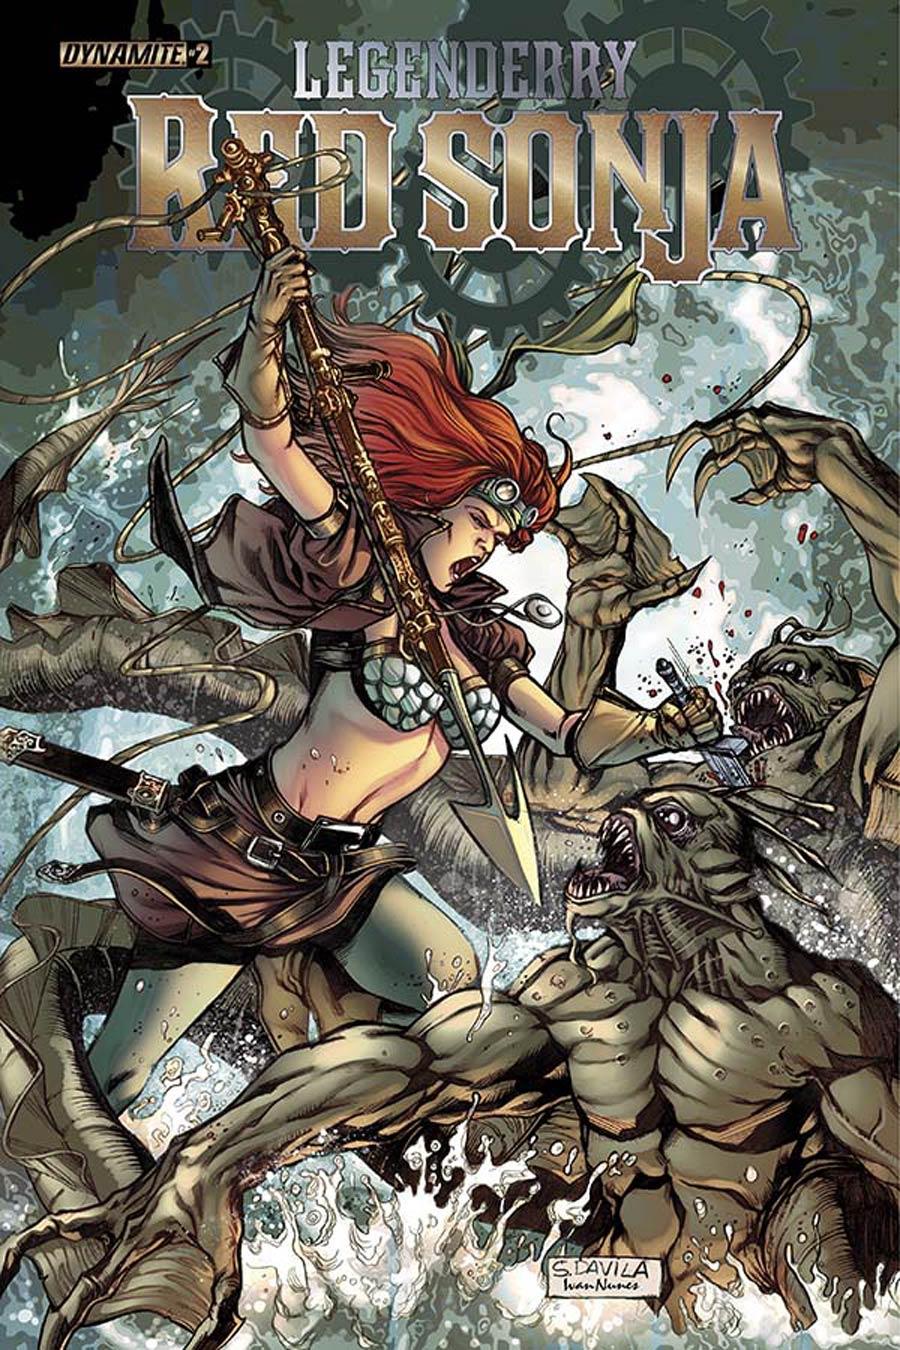 Legenderry Red Sonja #2 Cover A Regular Sergio Fernandez Davila Cover